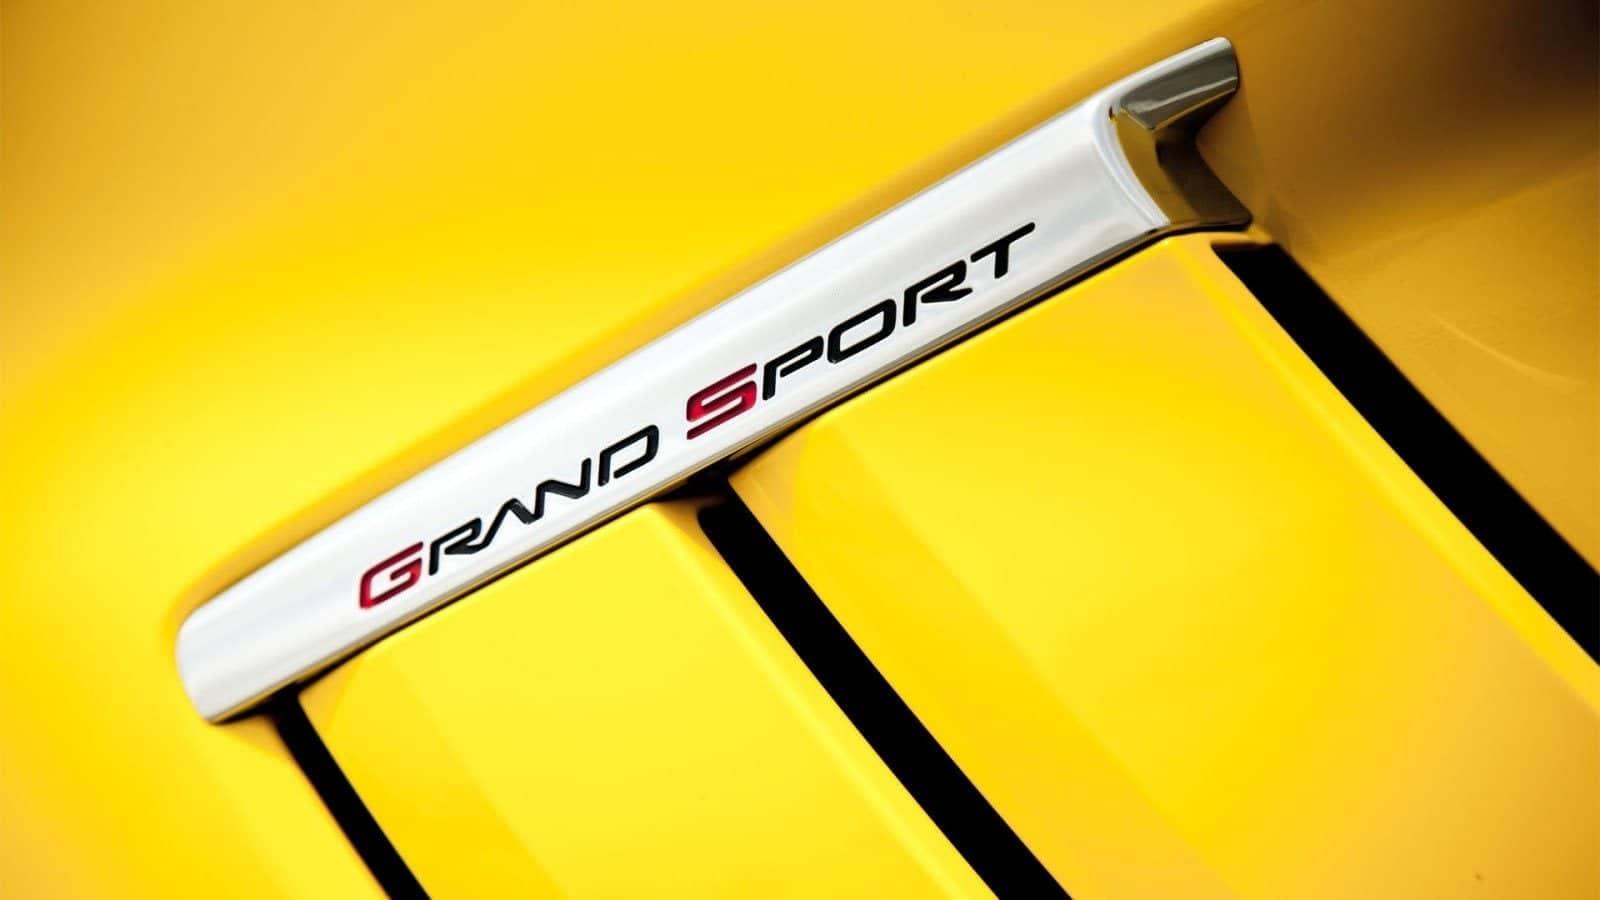 Grand Sport decal